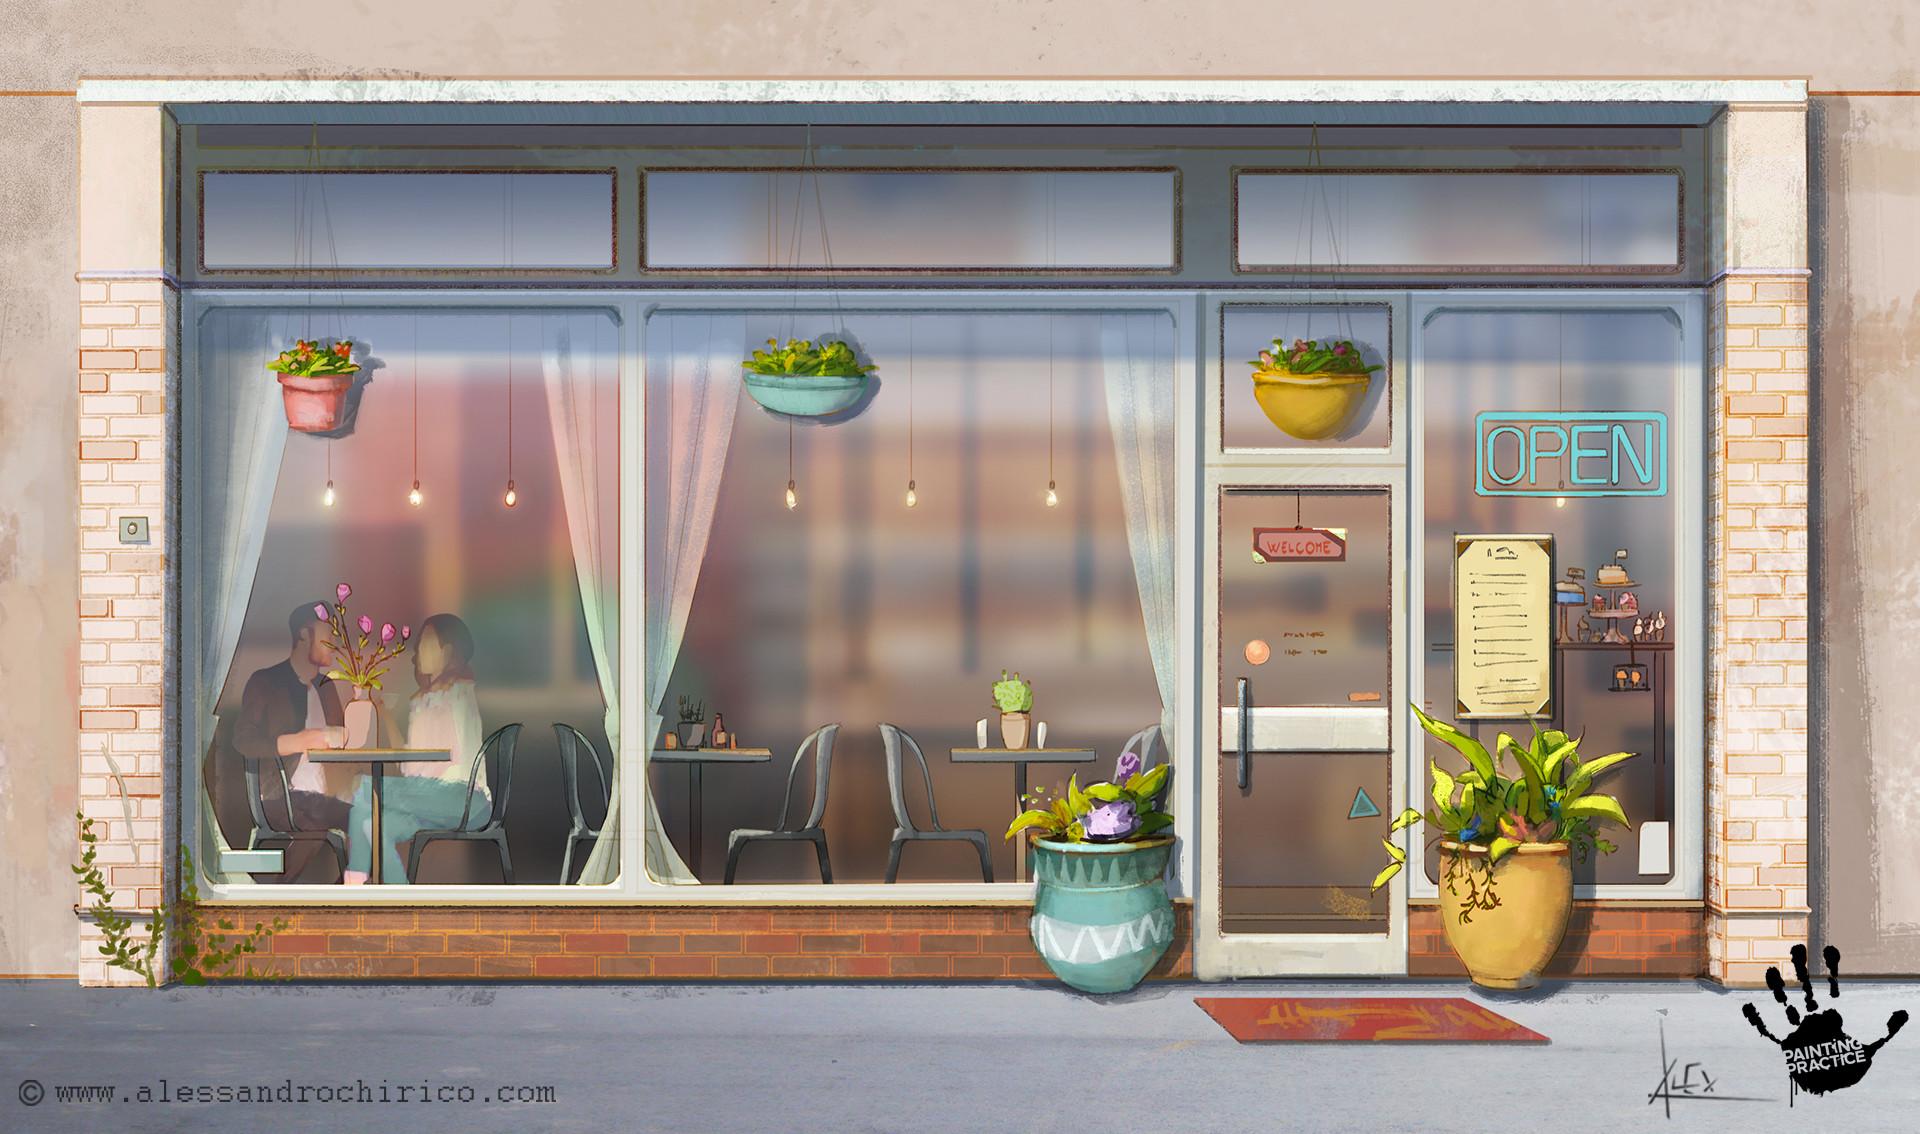 Alessandro chirico 09 cafe sketch alessandro chirico